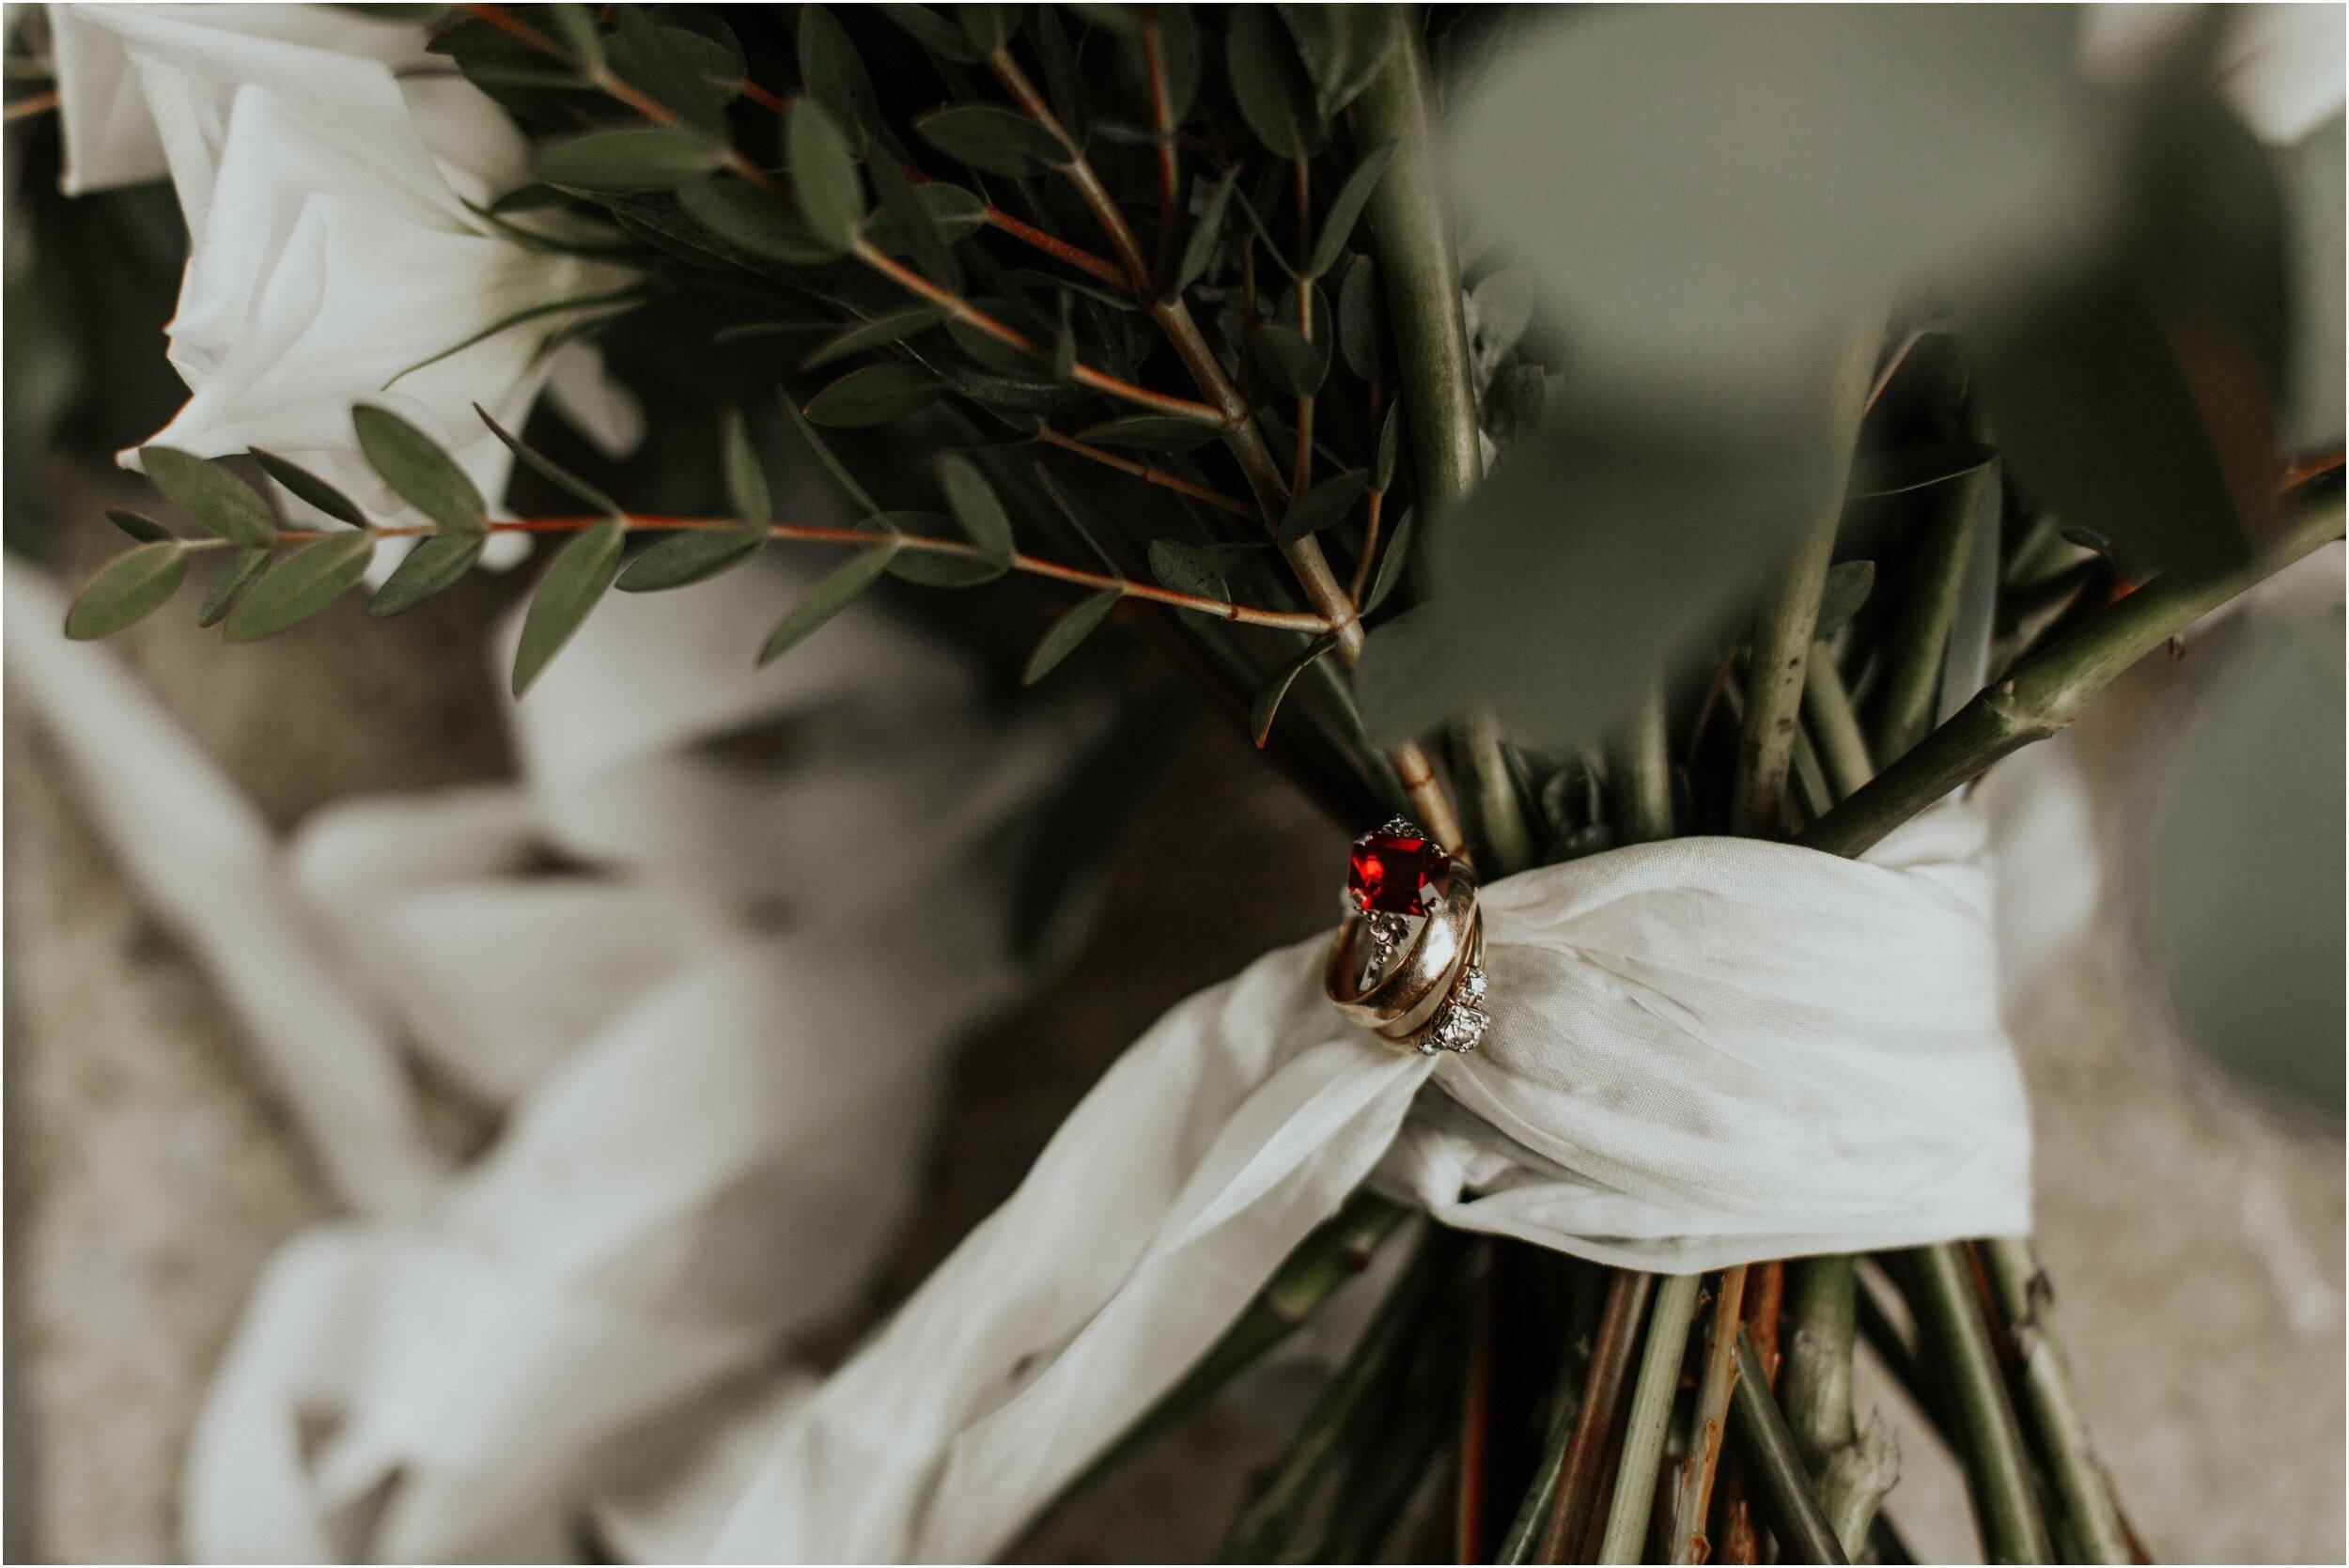 steph-and-jordan-cox-our-wedding-historic-shady-lane-compass-wedding-collective-hazel-lining-photography-destination-elopement-wedding-engagement-photography_0011.jpg